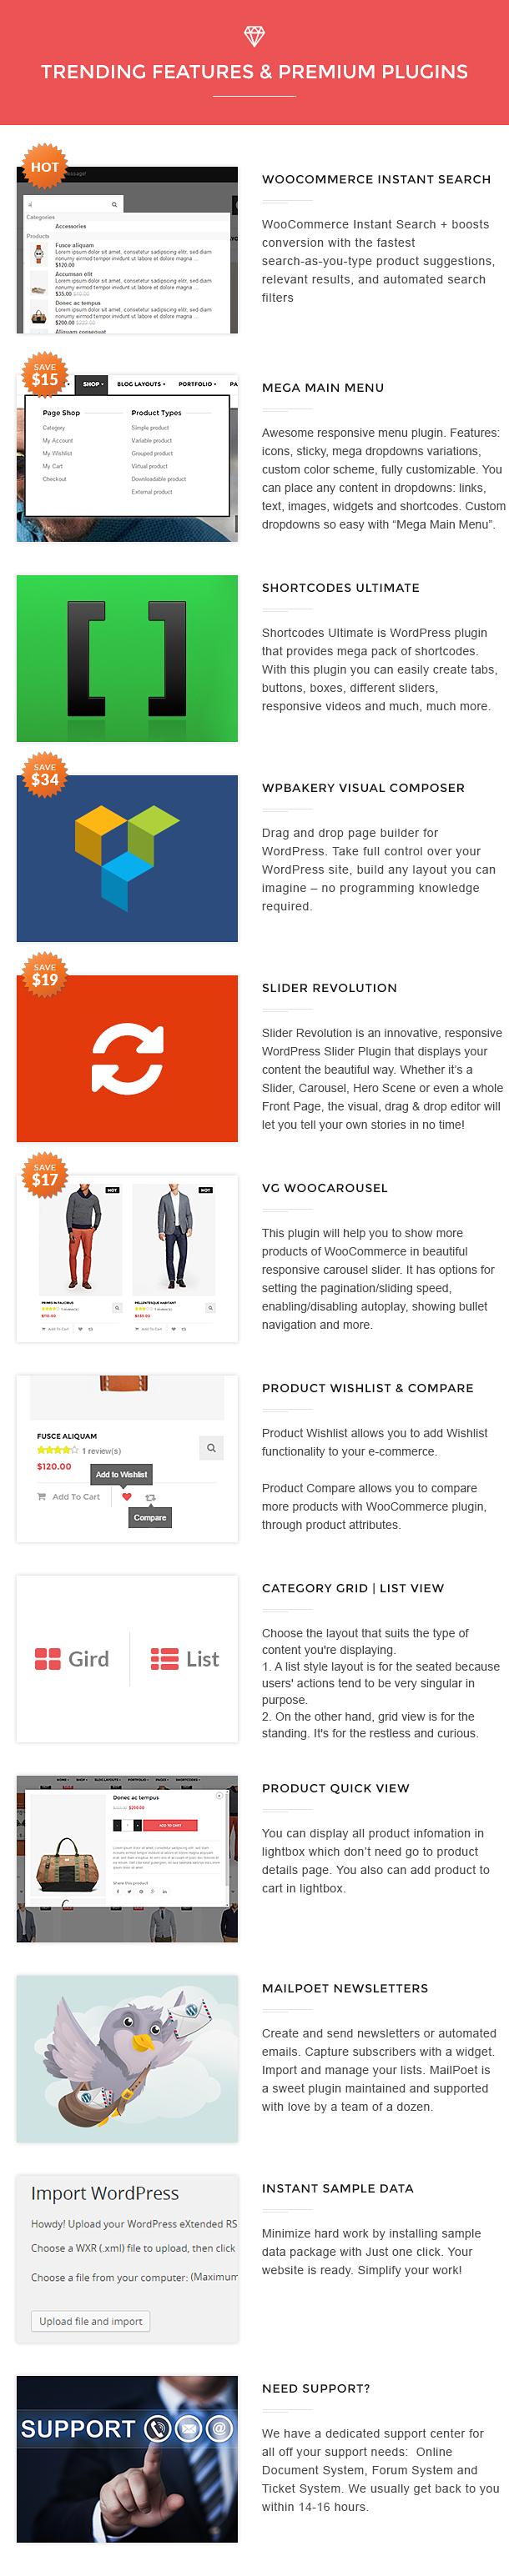 VG Greek - Fashion WooCommerce WordPress Theme - 41